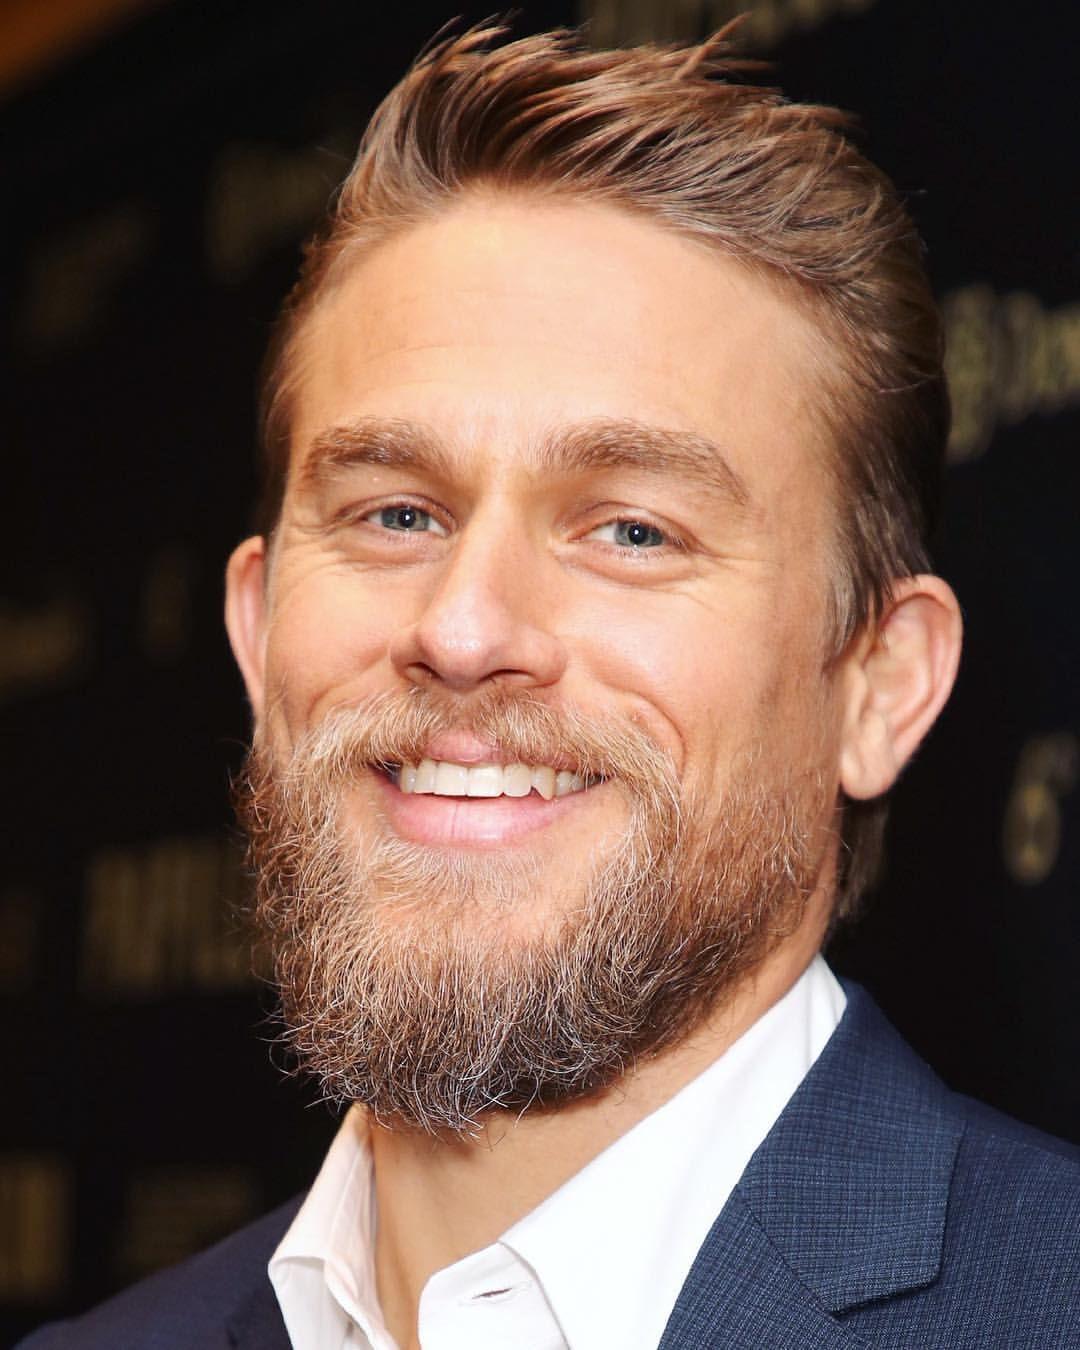 That Hint Of Grey In His Beard Charliehunnam Papillonmovie Charlie Hunnam Beard Hair And Beard Styles